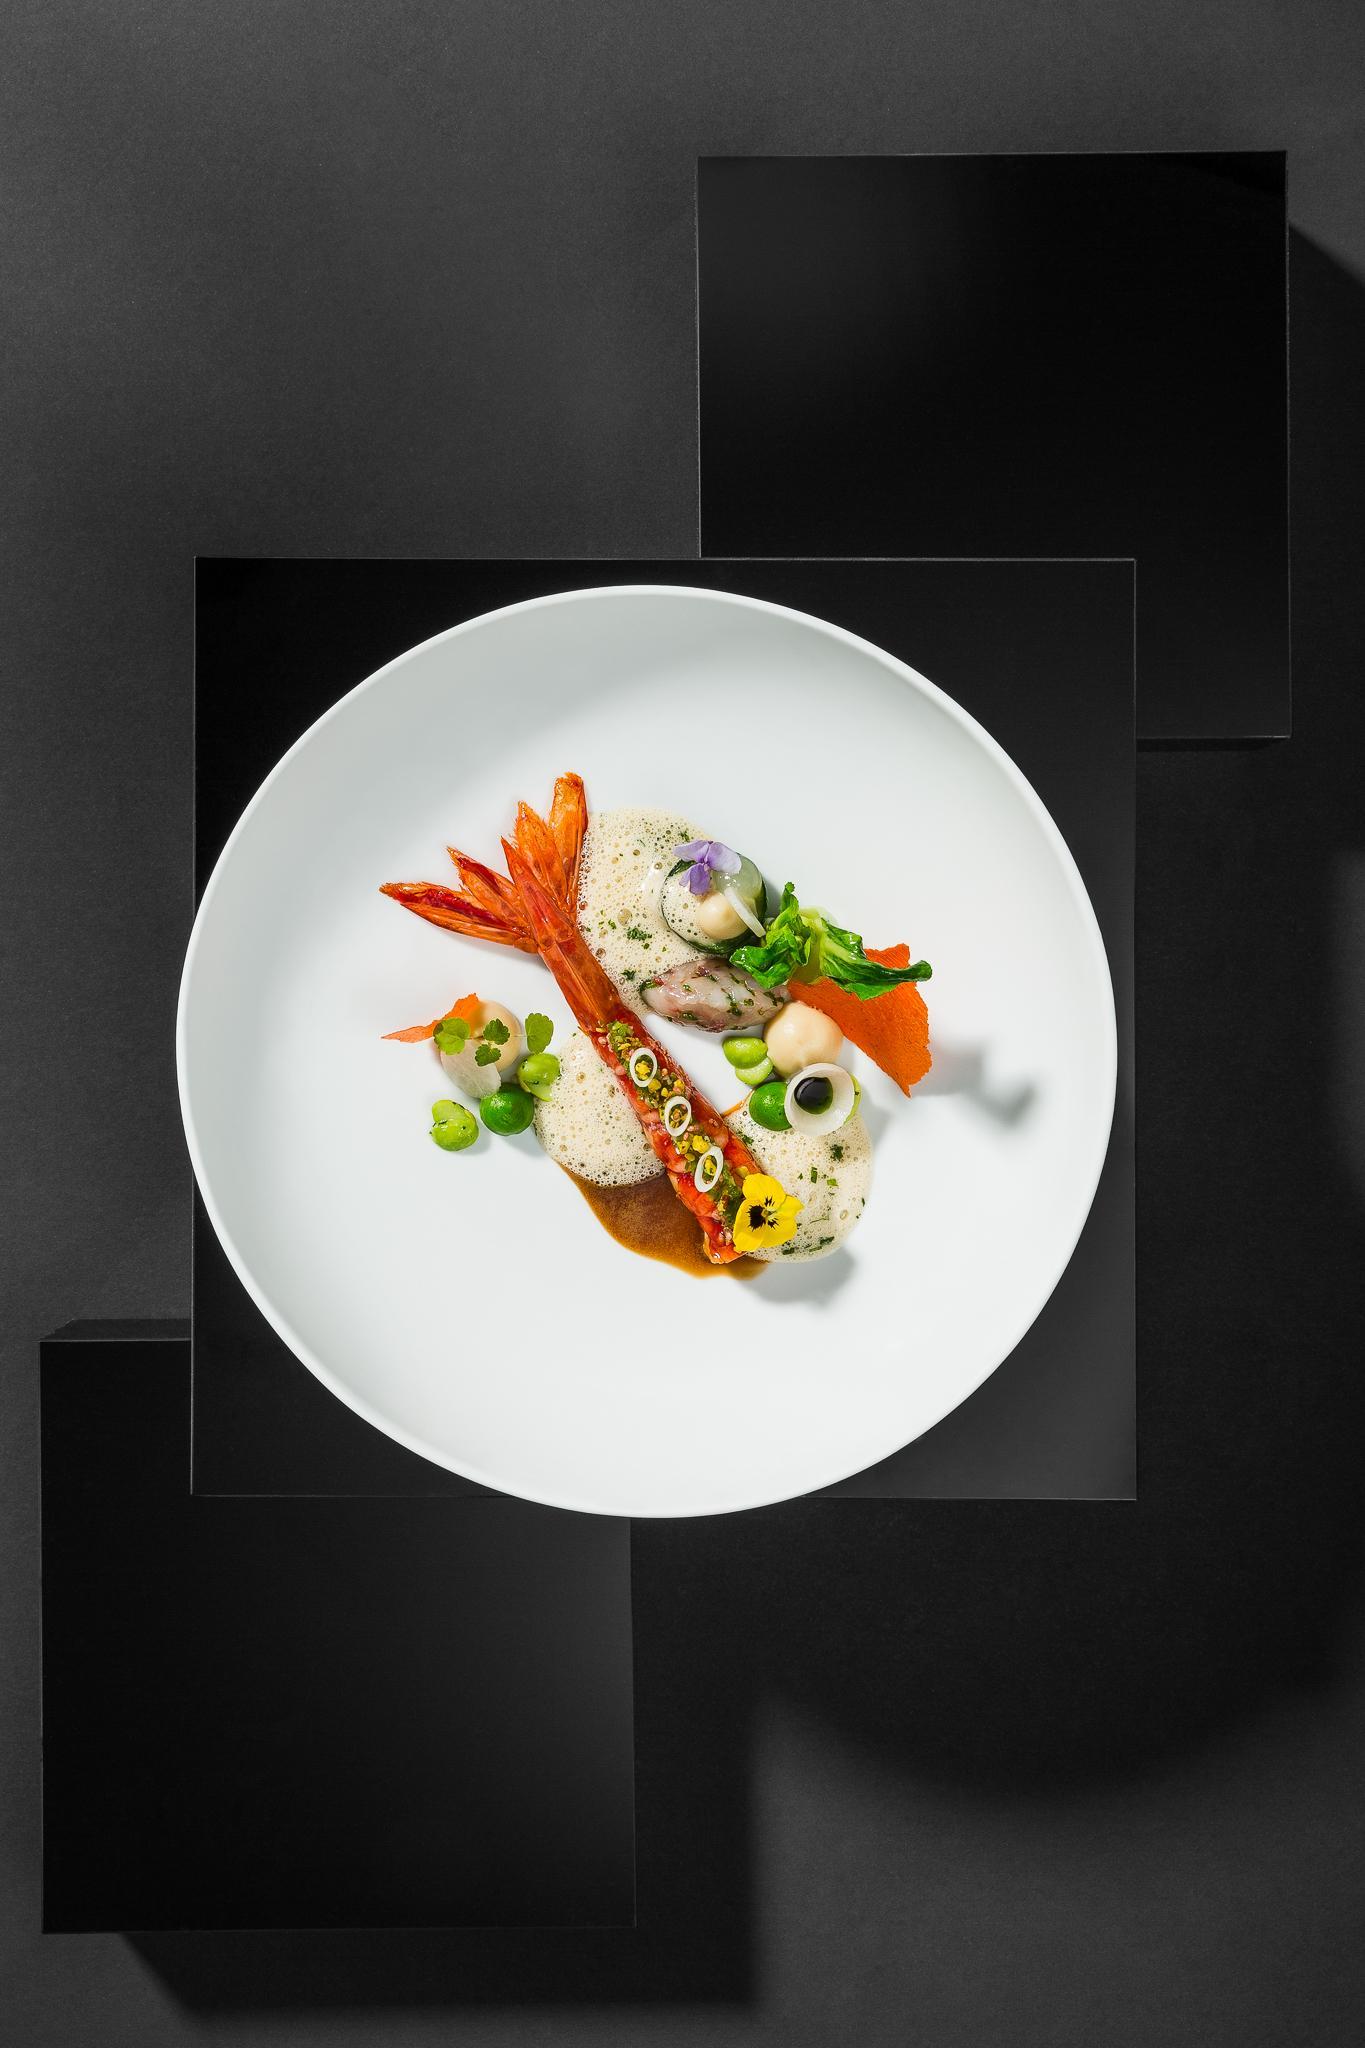 Kirchgasser Photography Bausteine Cookbook By Christian Bau